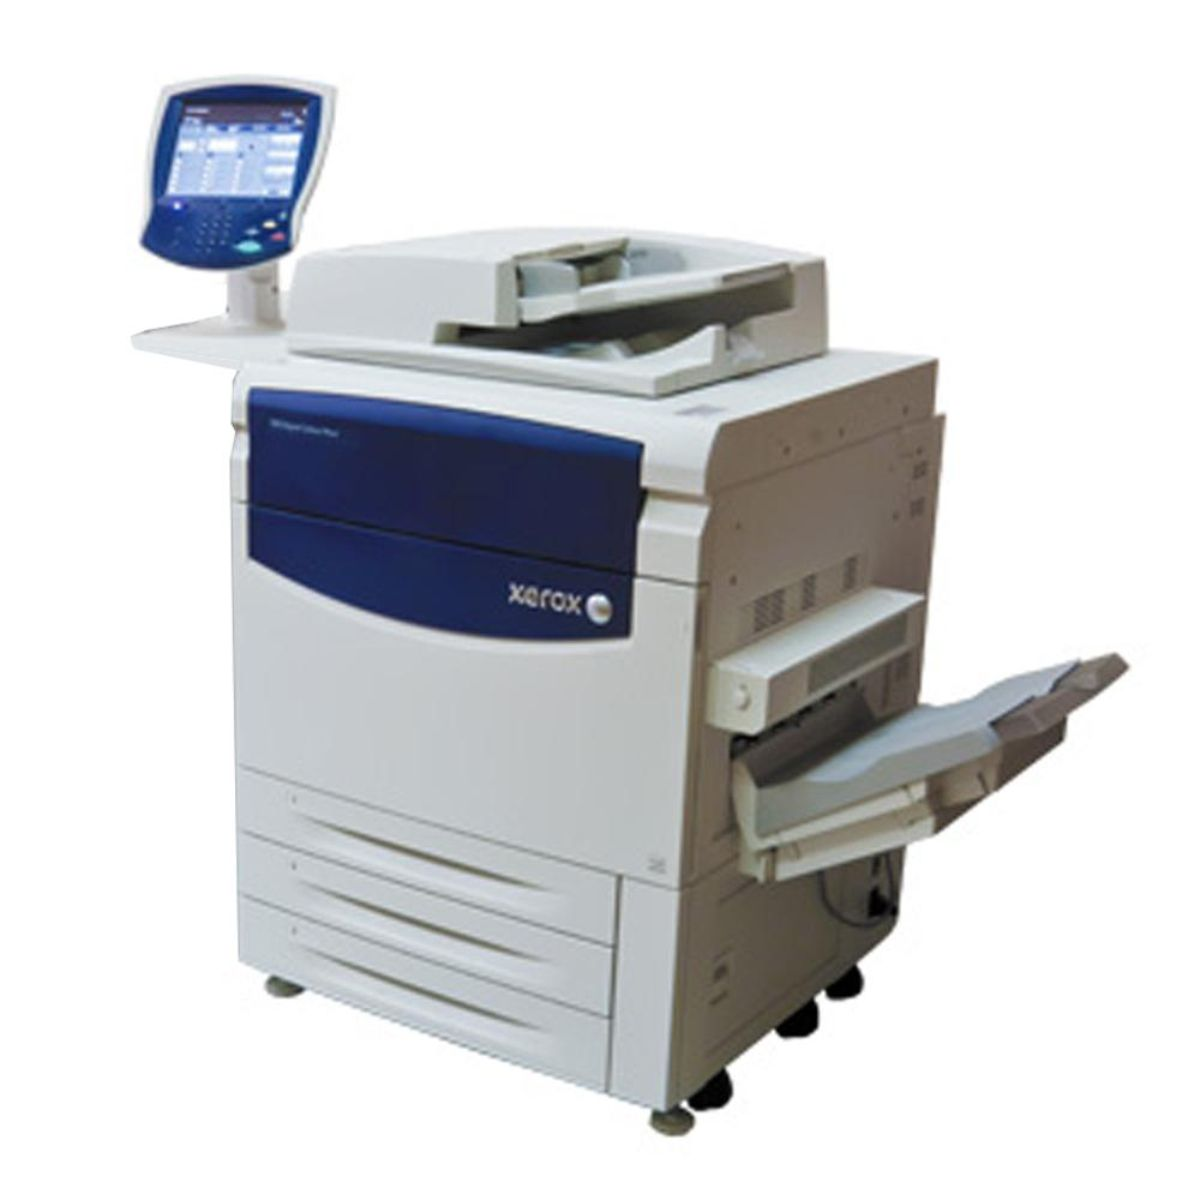 Xerox Digital Color Press 700I Seminova